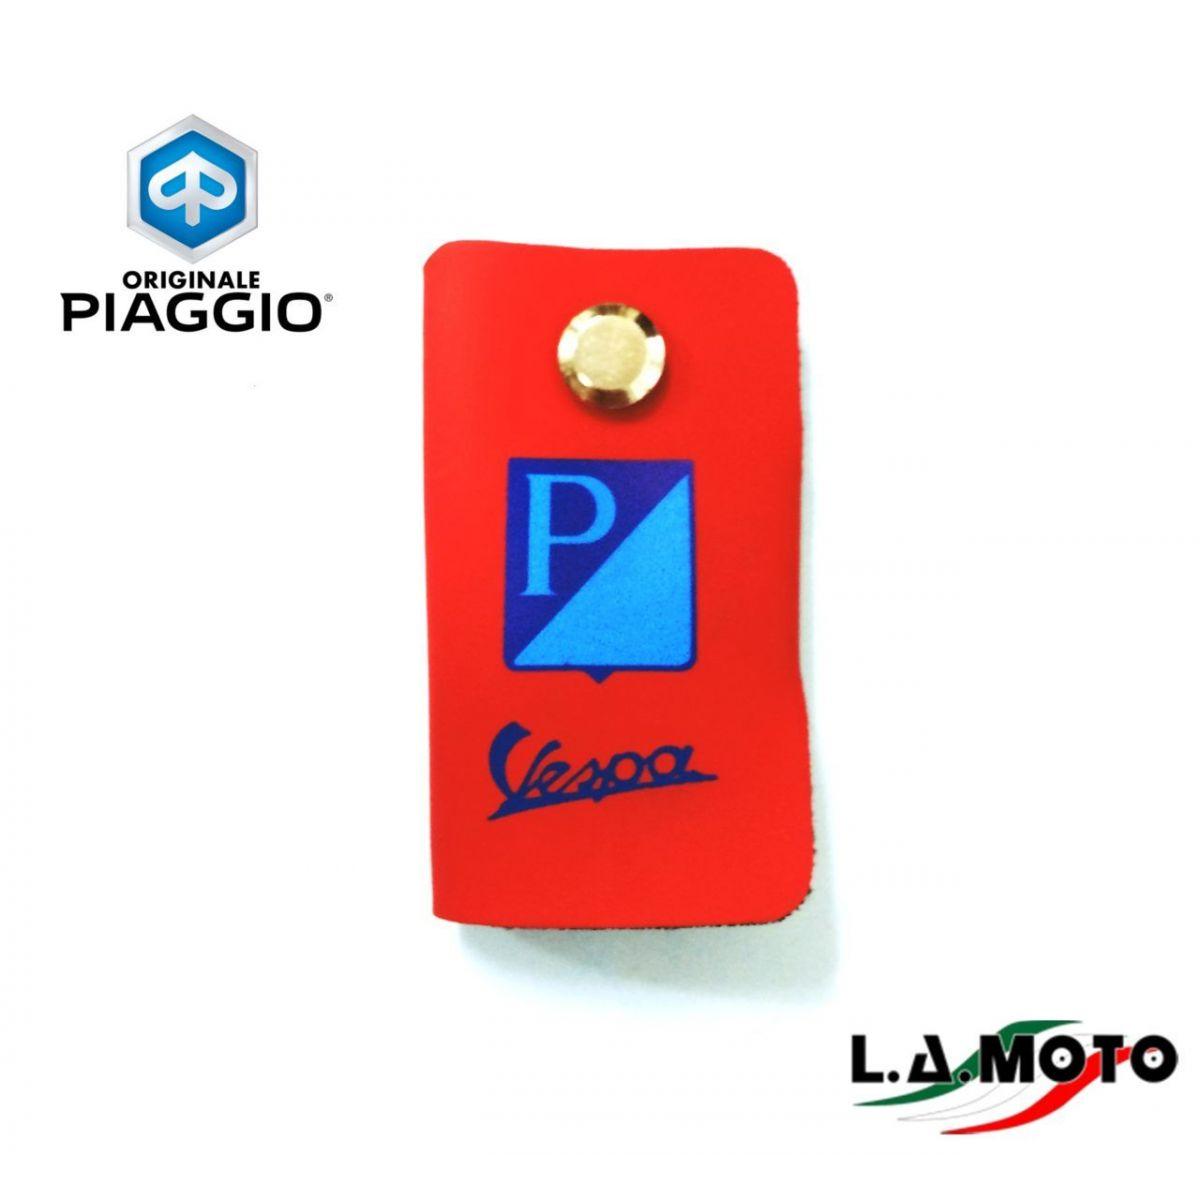 Portachiavi vintage rosso per VESPA originale PIAGGIO